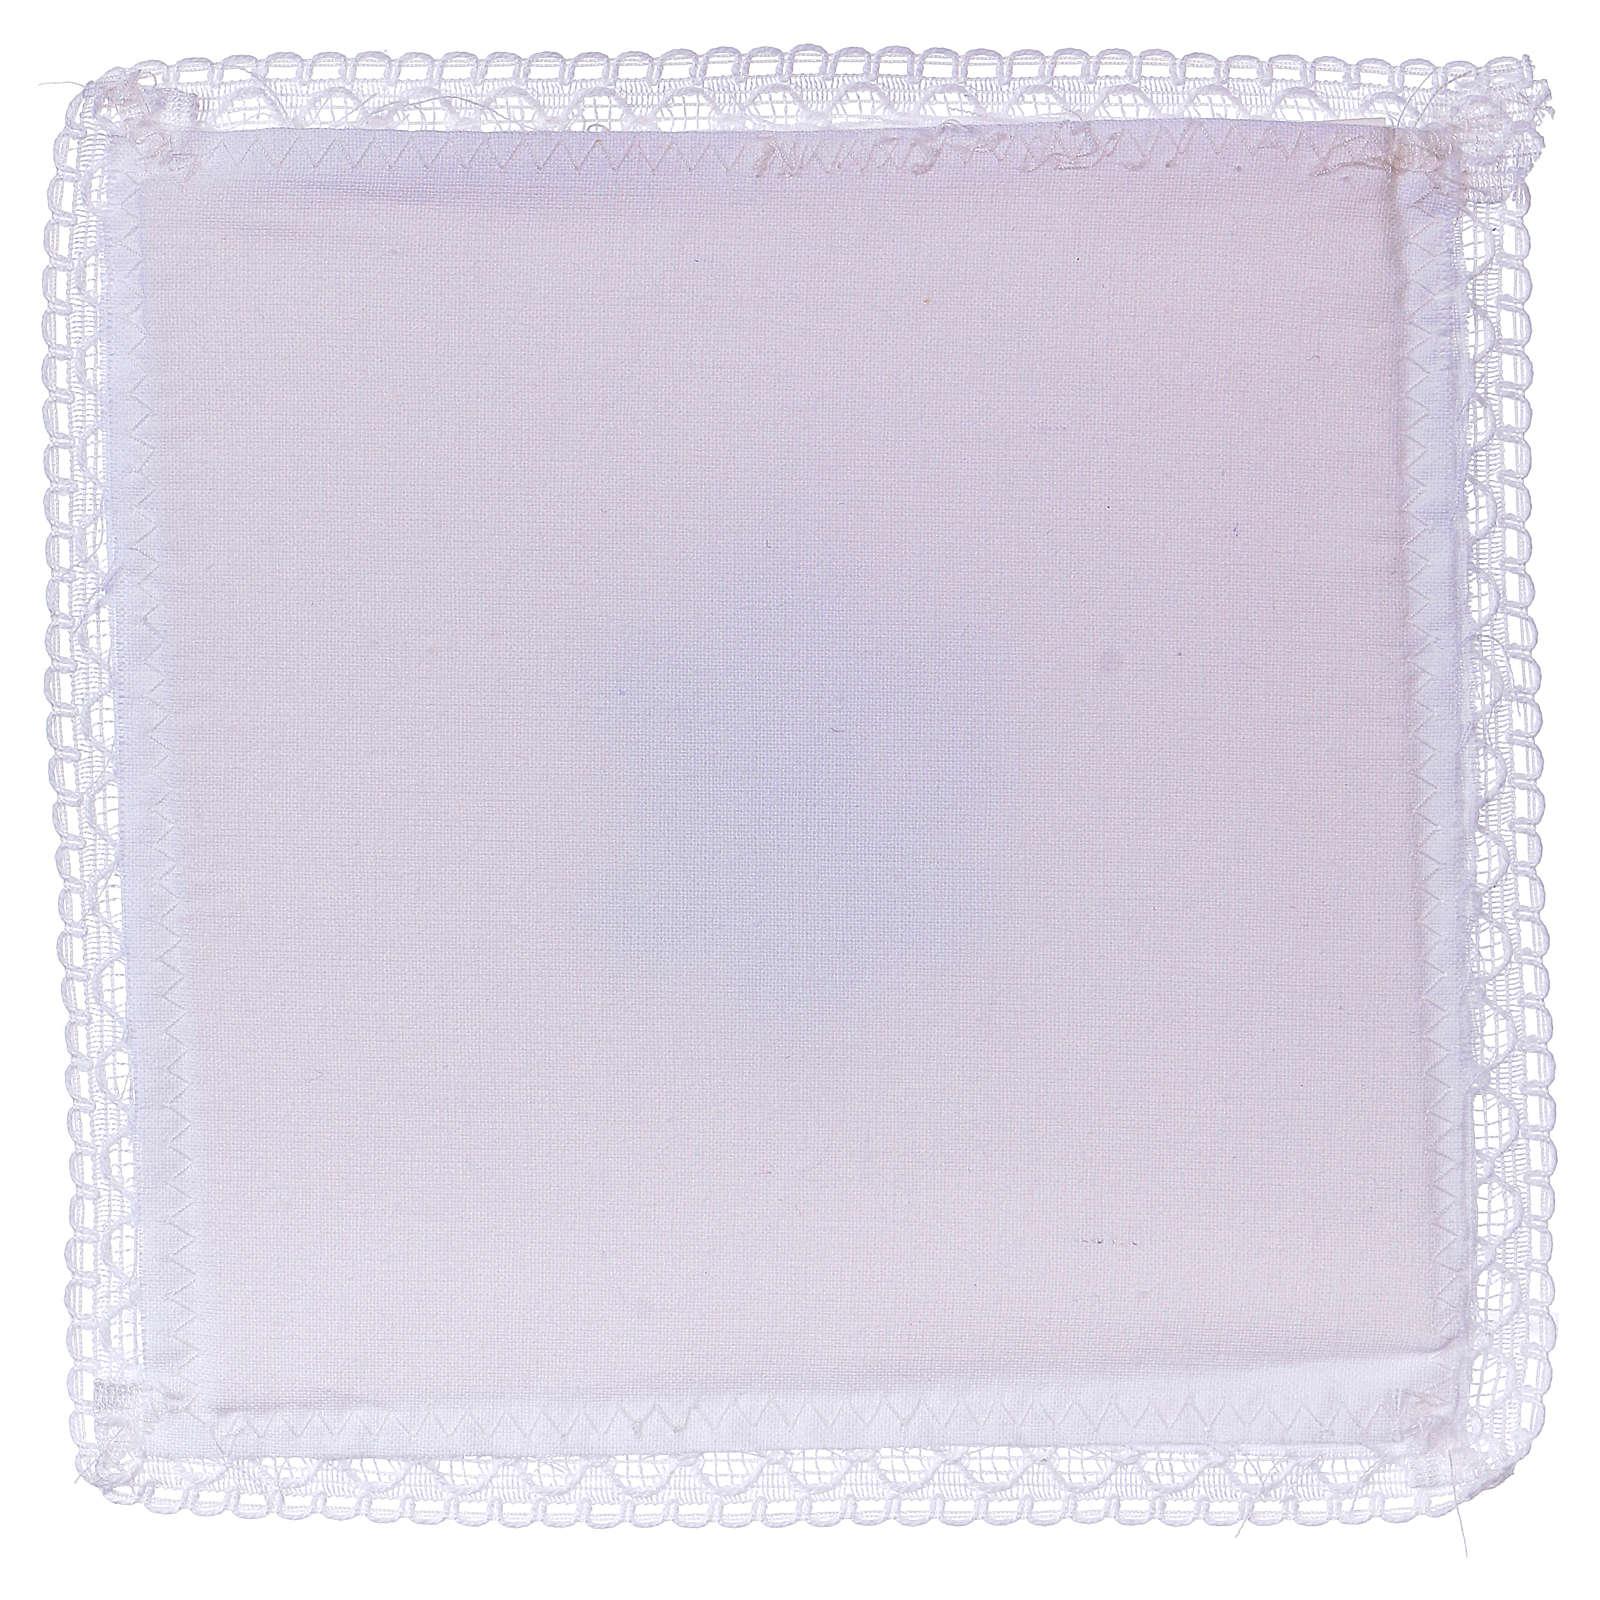 Pale IHS tissu 100% coton 4